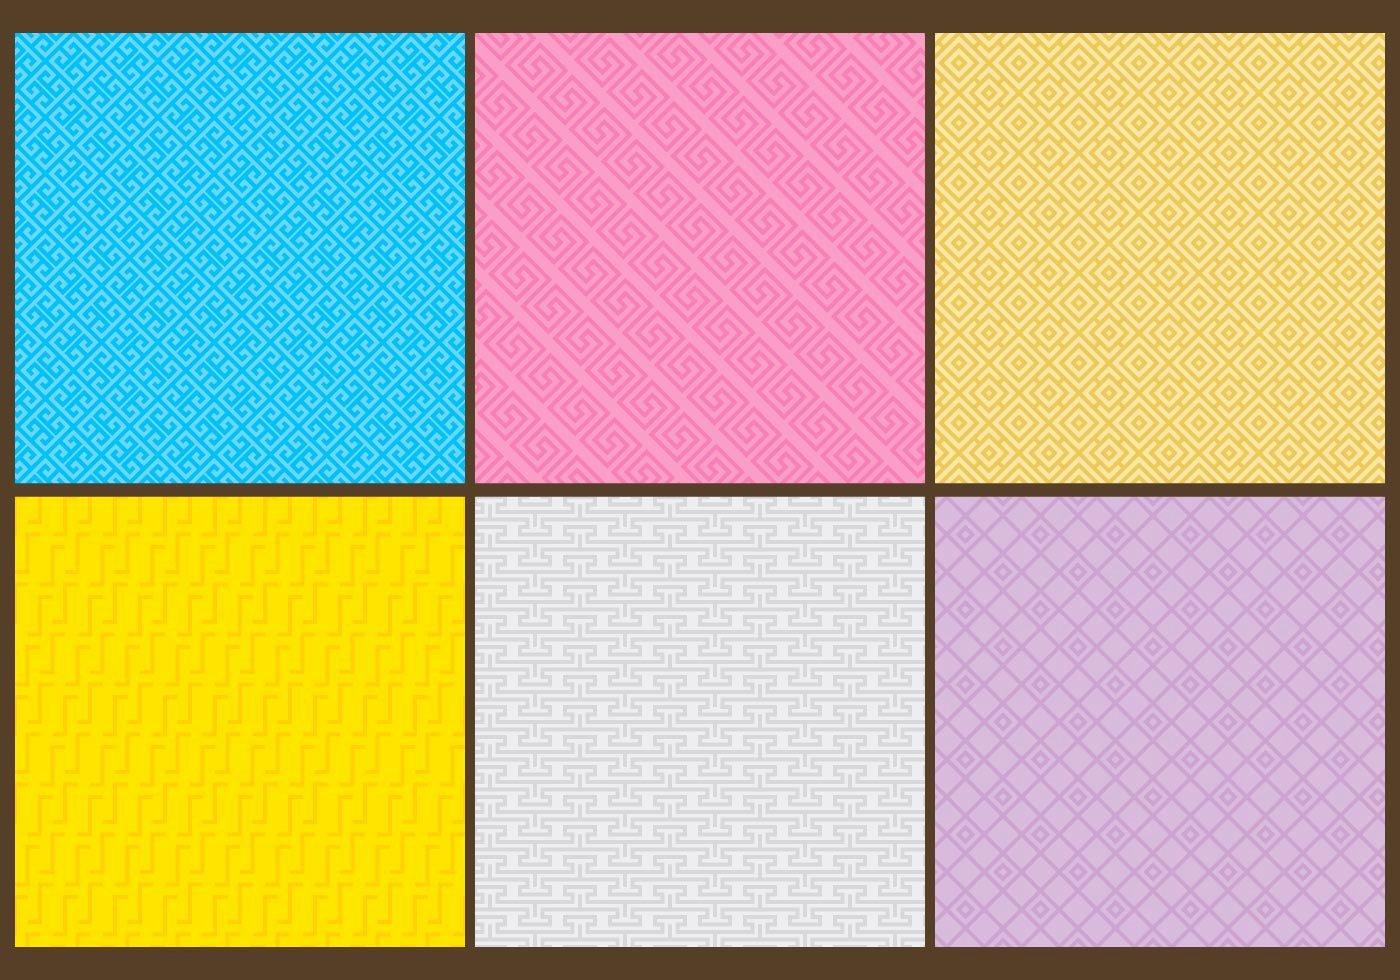 Greek Key Pattern Template Beautiful Greek Key Patterns Download Free Vector Art Stock